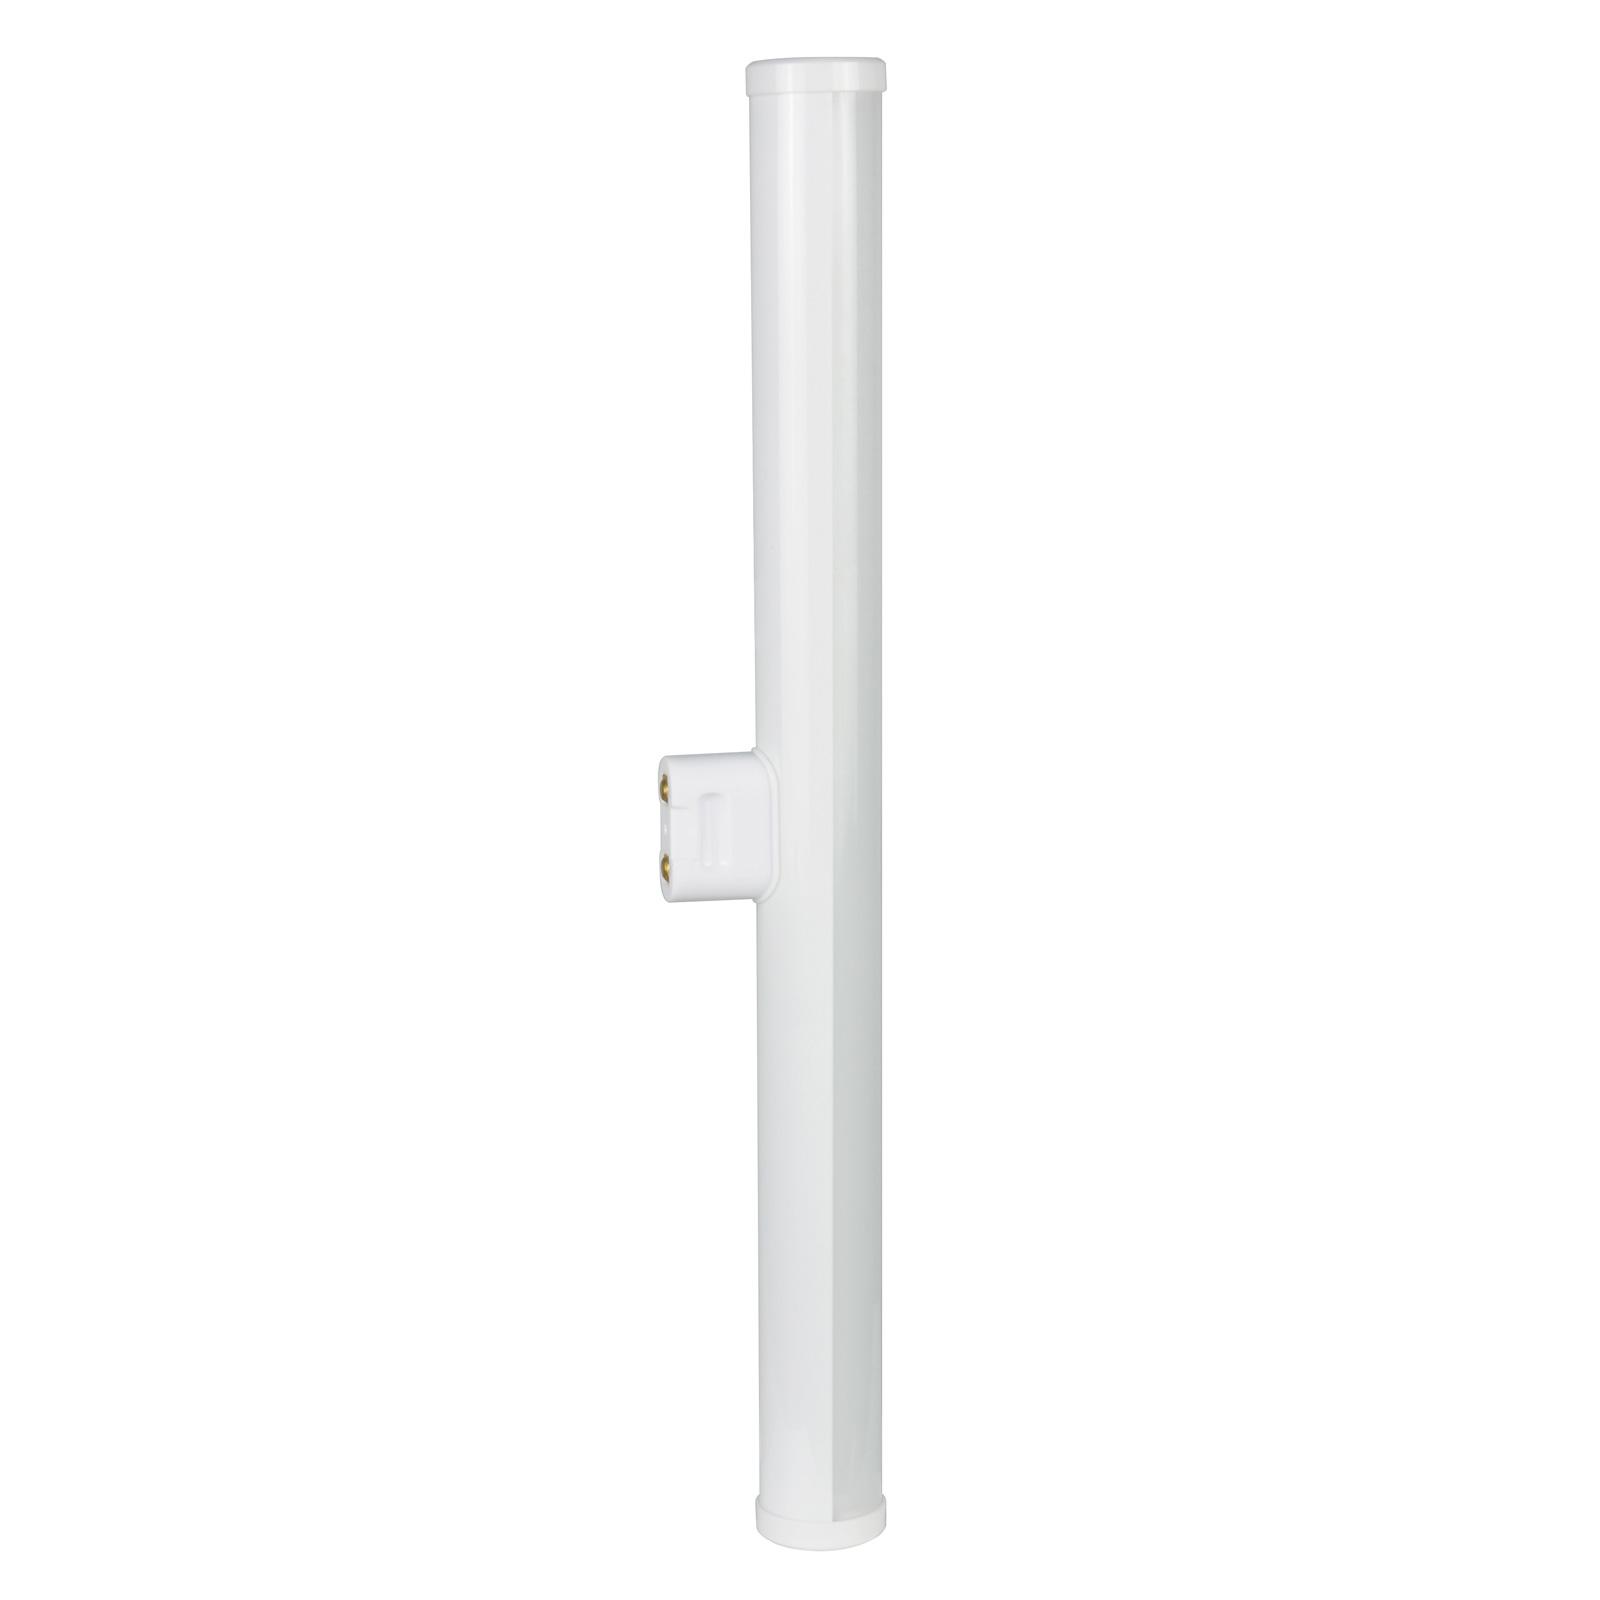 LED-linjepære S14d 3,5W 827 1-sokkel 300mm